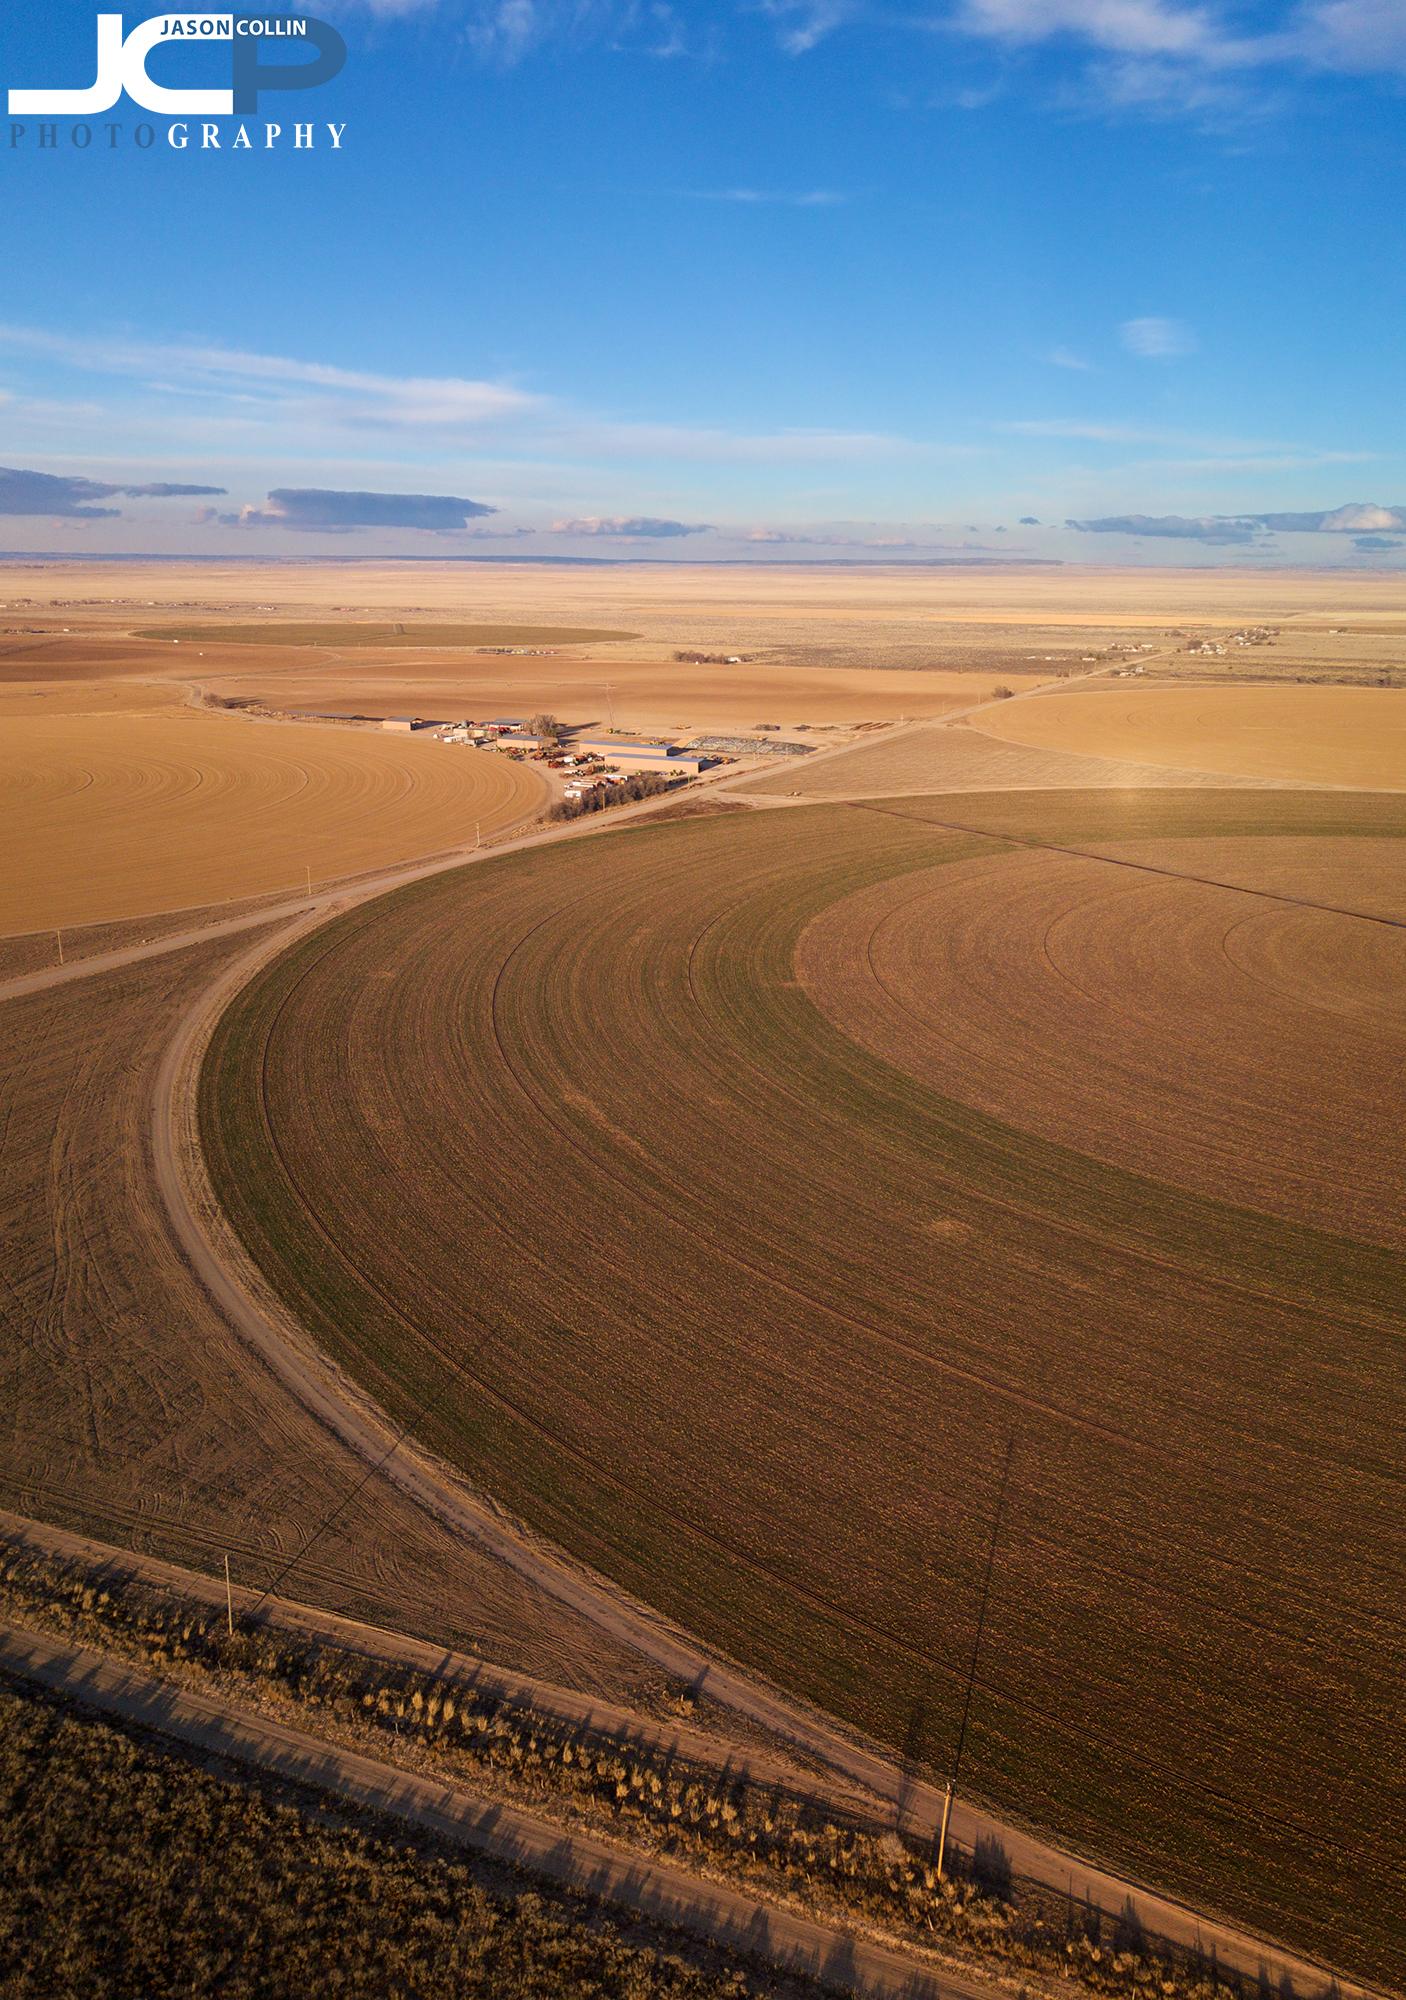 Rural New Mexico drone photo of Moriarty farmland - made with DJI Mavic Pro & PolarPro ND8 filter